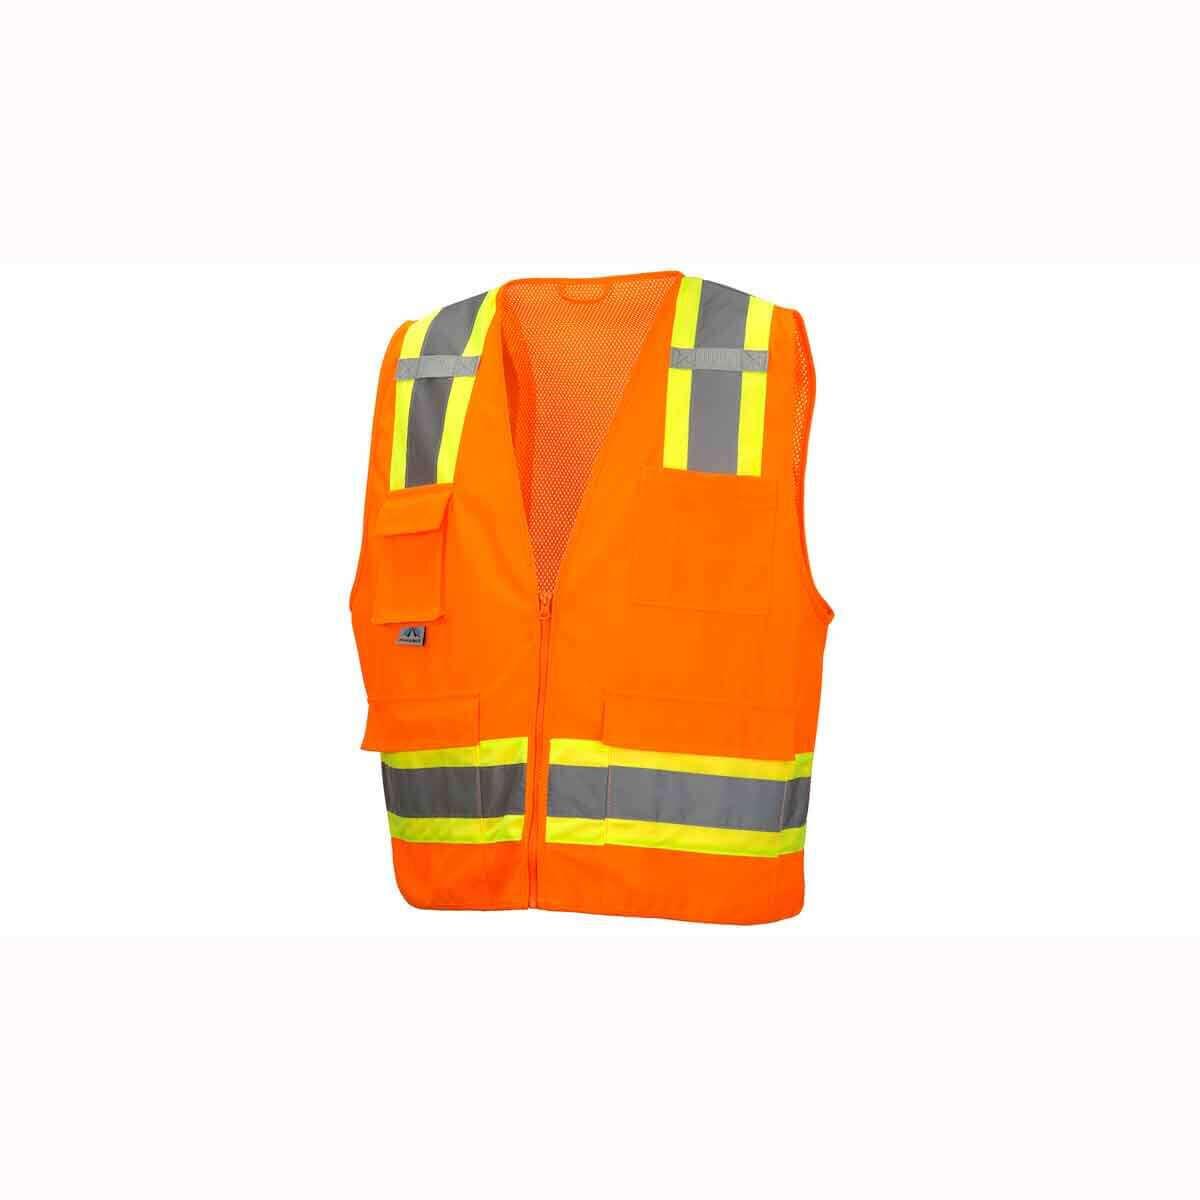 Pyramex RVZ24 Neon Orange Safety Vests